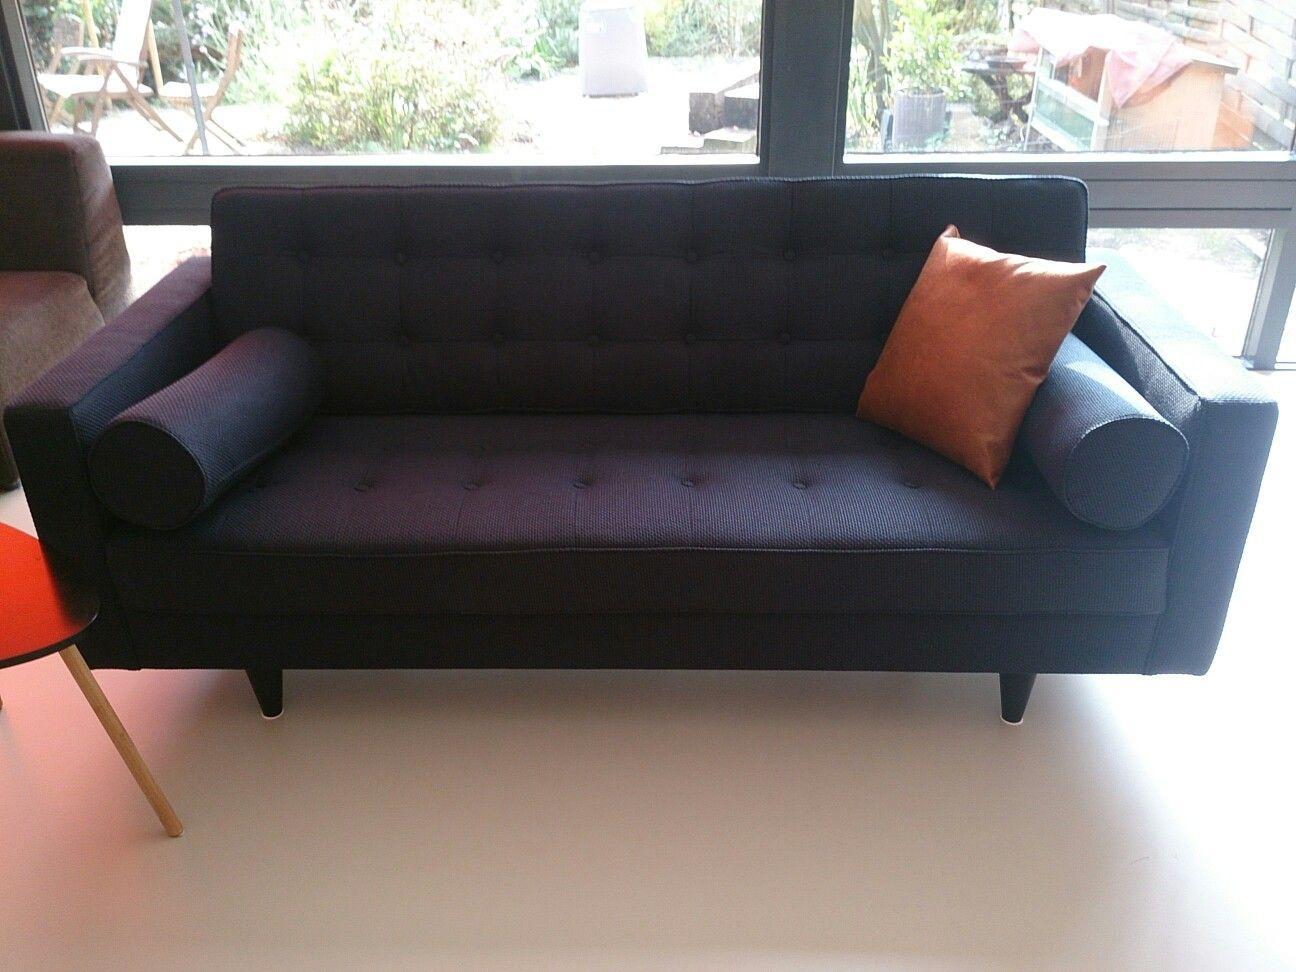 4 Zits Bank Trendhopper.Trendhopper Livio 3 Zits Bank Navy Blue Style Sofa Couch En Blue